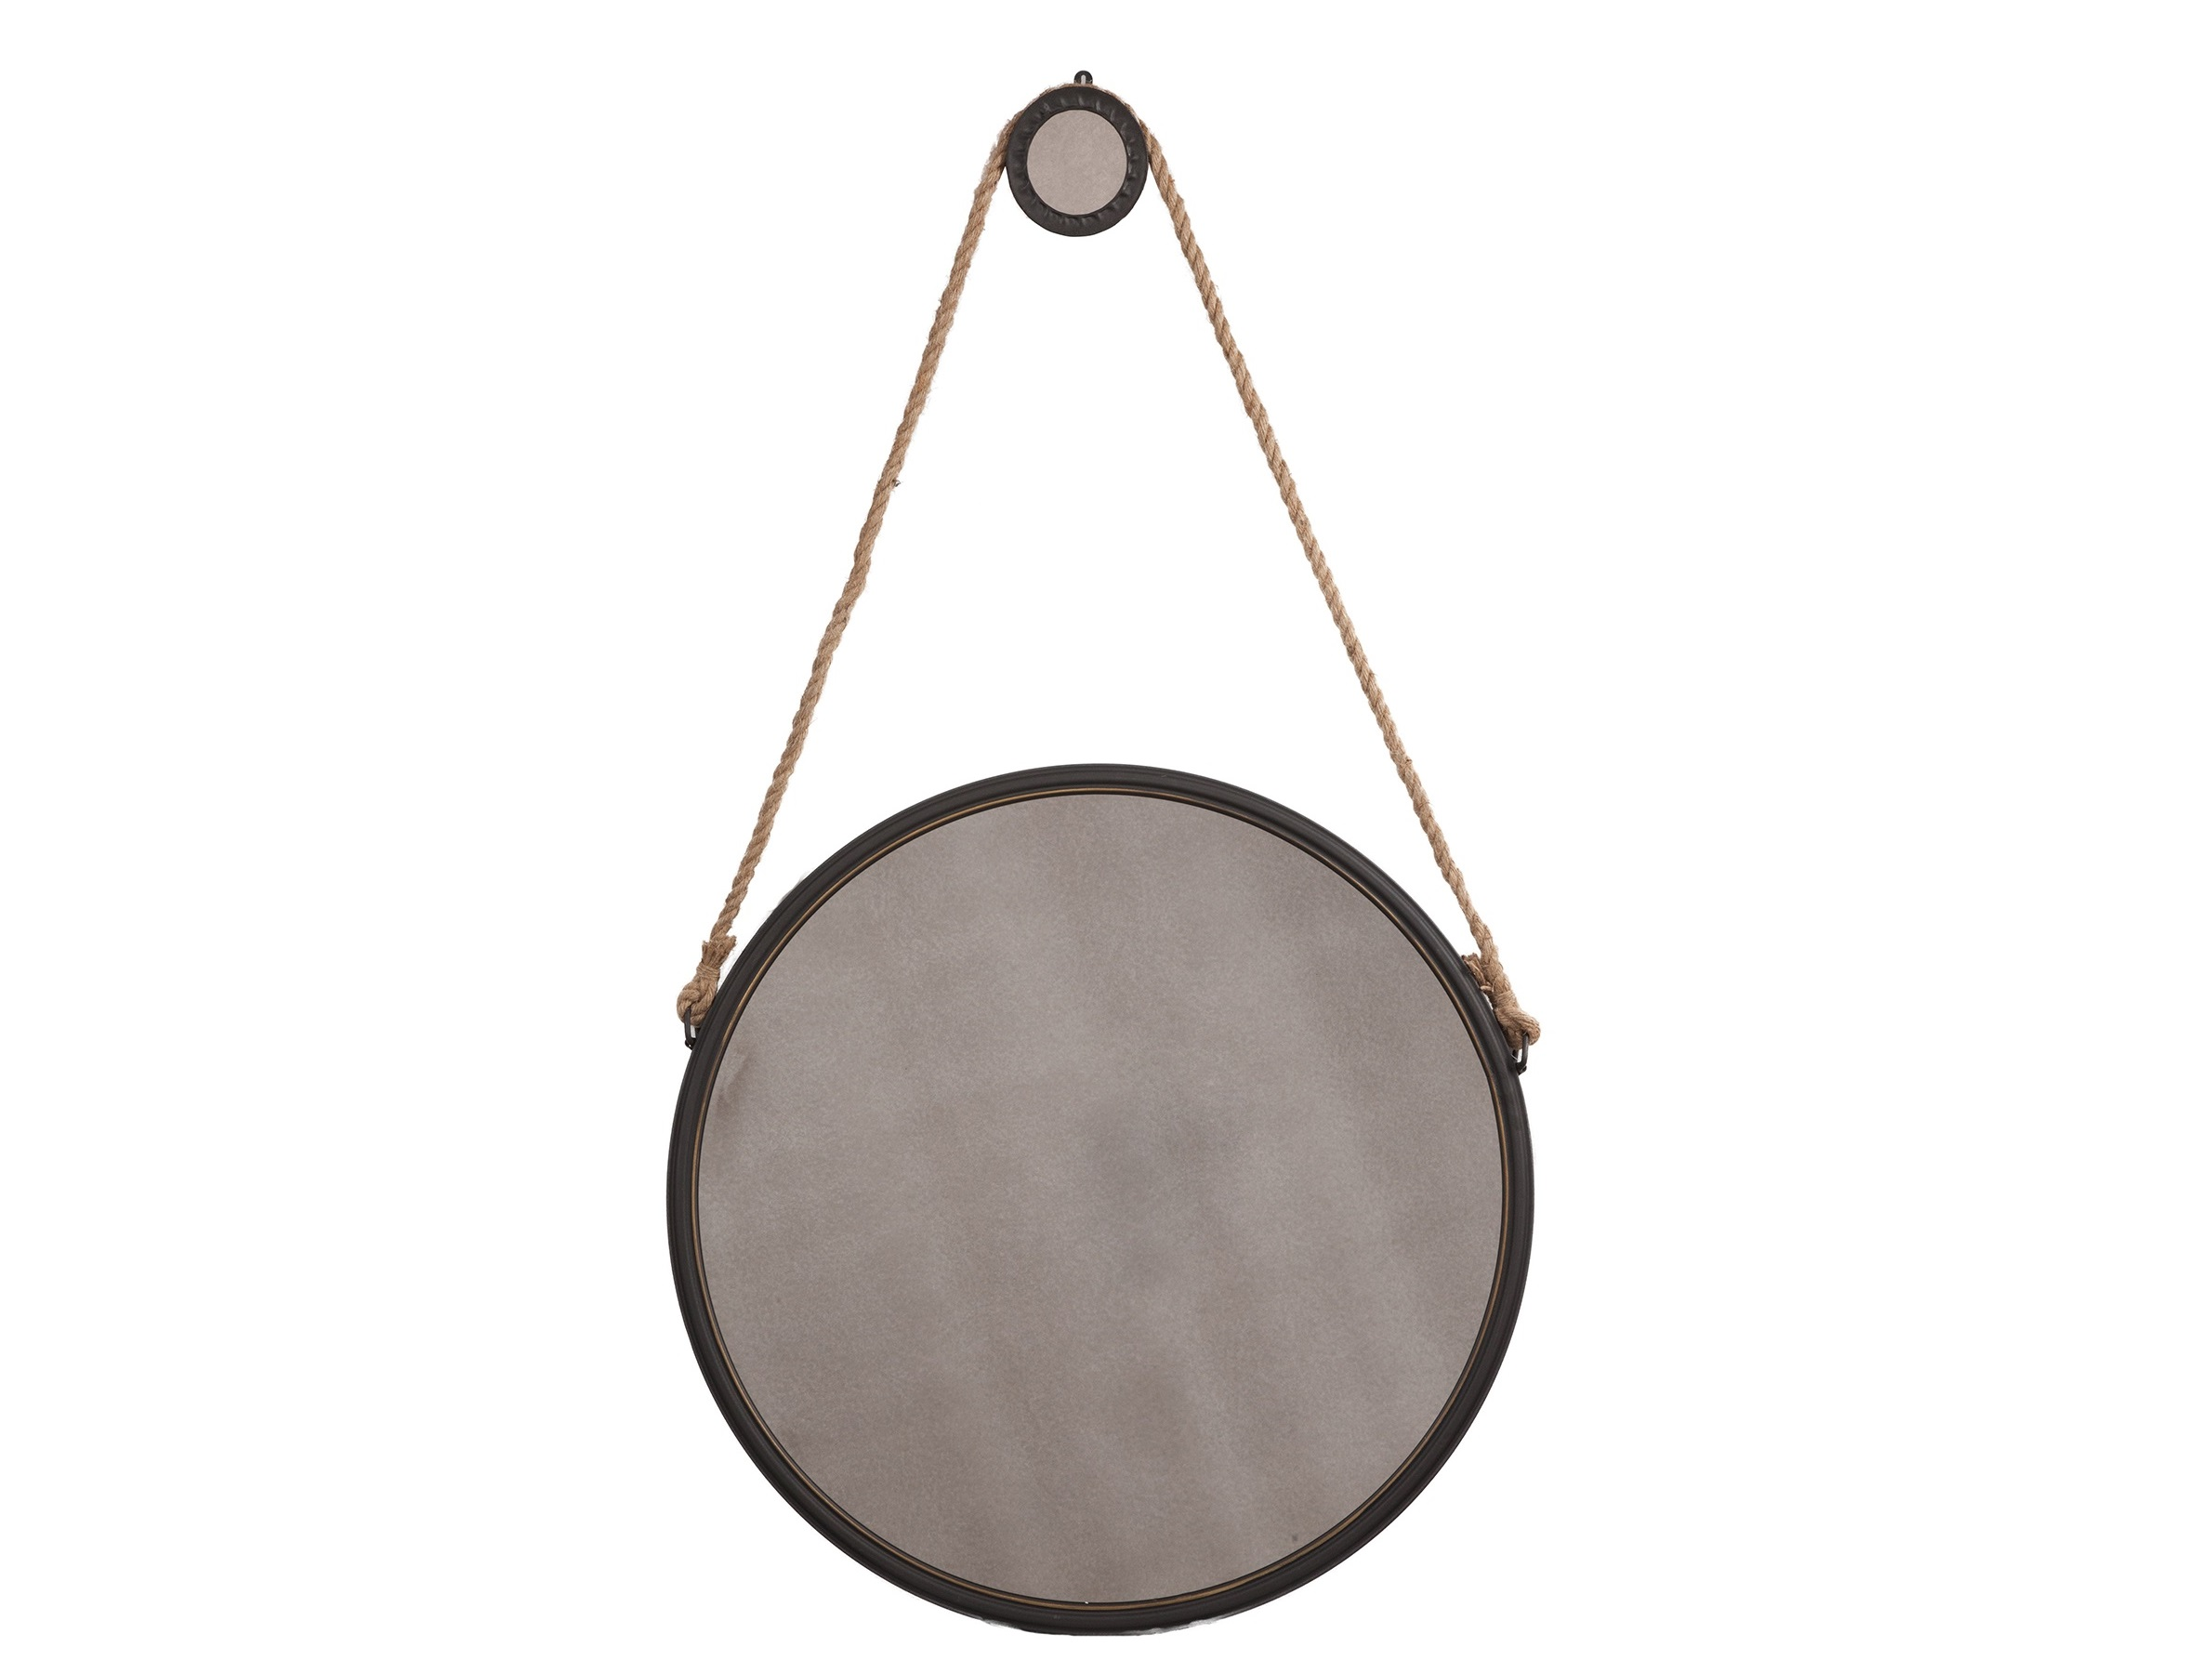 Зеркало Iron and Rope RoundНастенные зеркала<br>Материал: Металл, Экокожа<br><br>Material: Металл<br>Length см: None<br>Width см: None<br>Depth см: 4,5<br>Height см: 75<br>Diameter см: 75